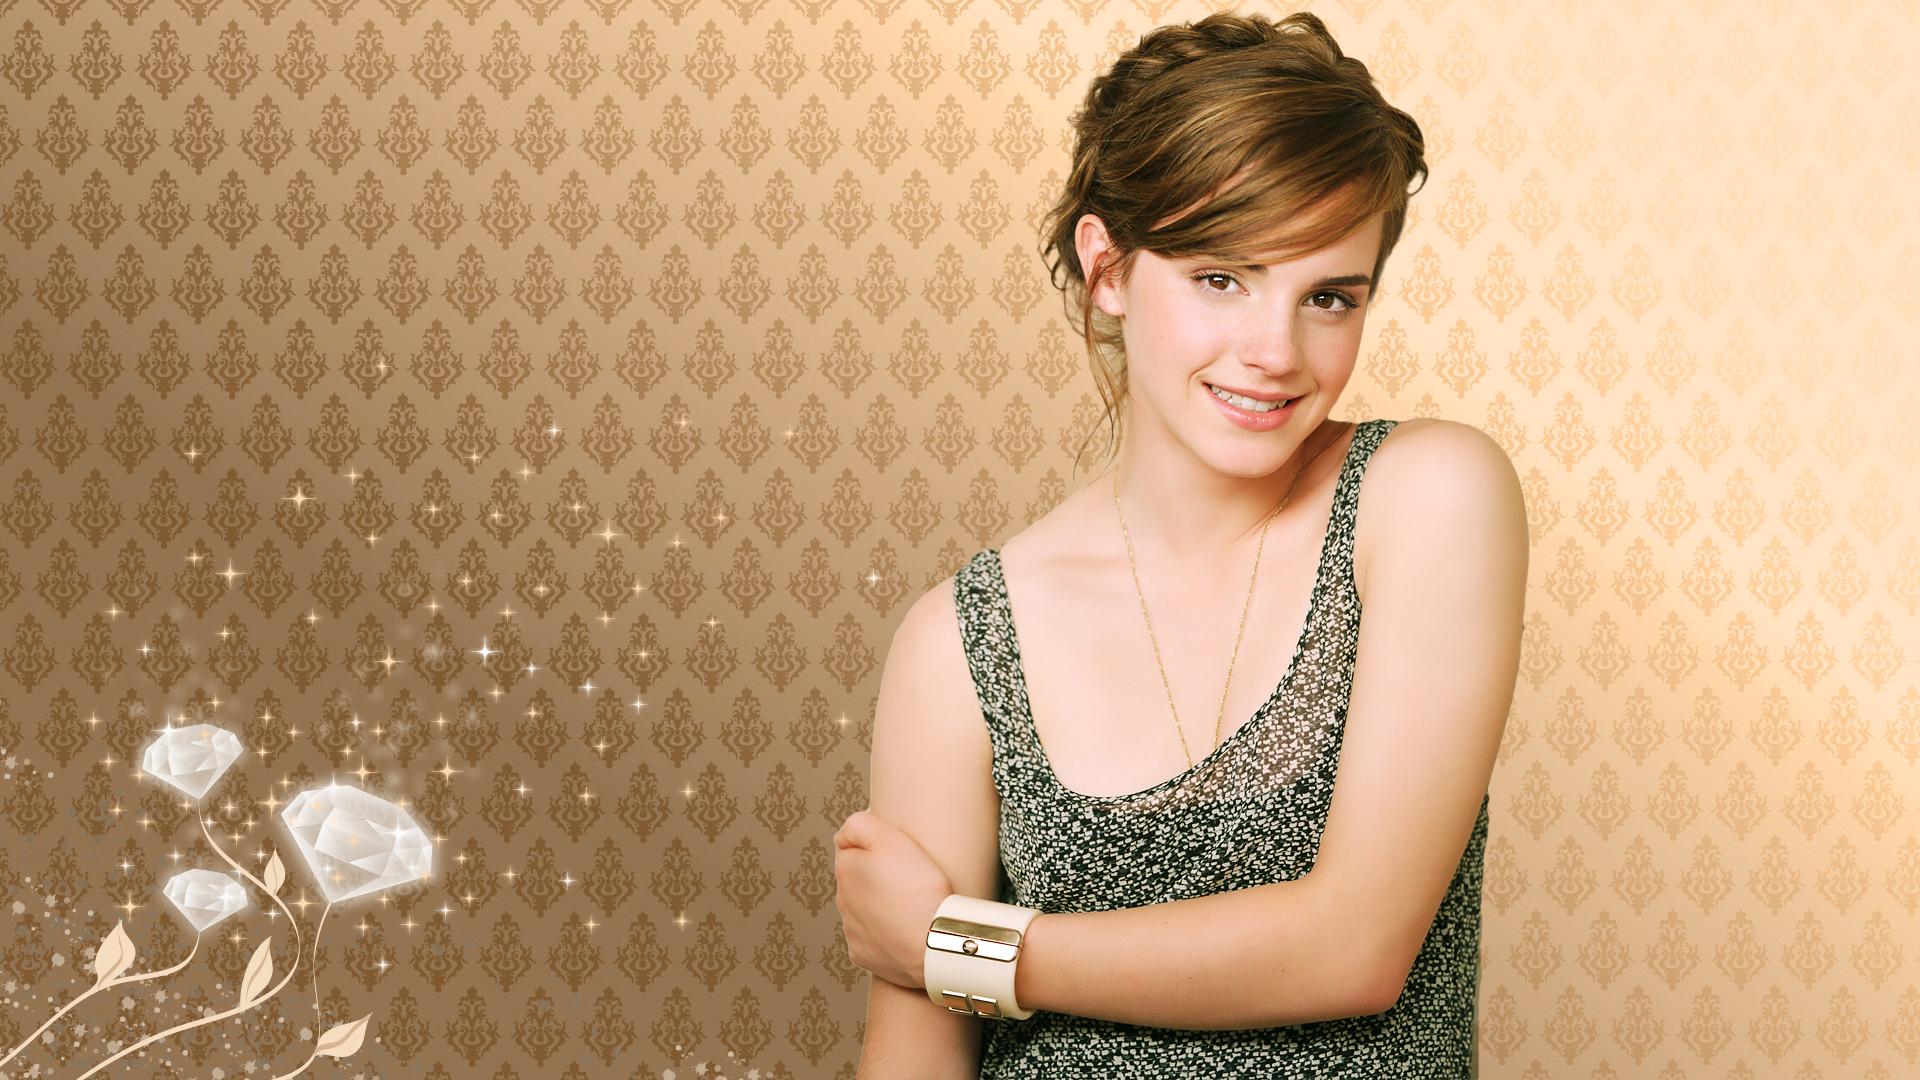 569 Emma Watson Wallpapers